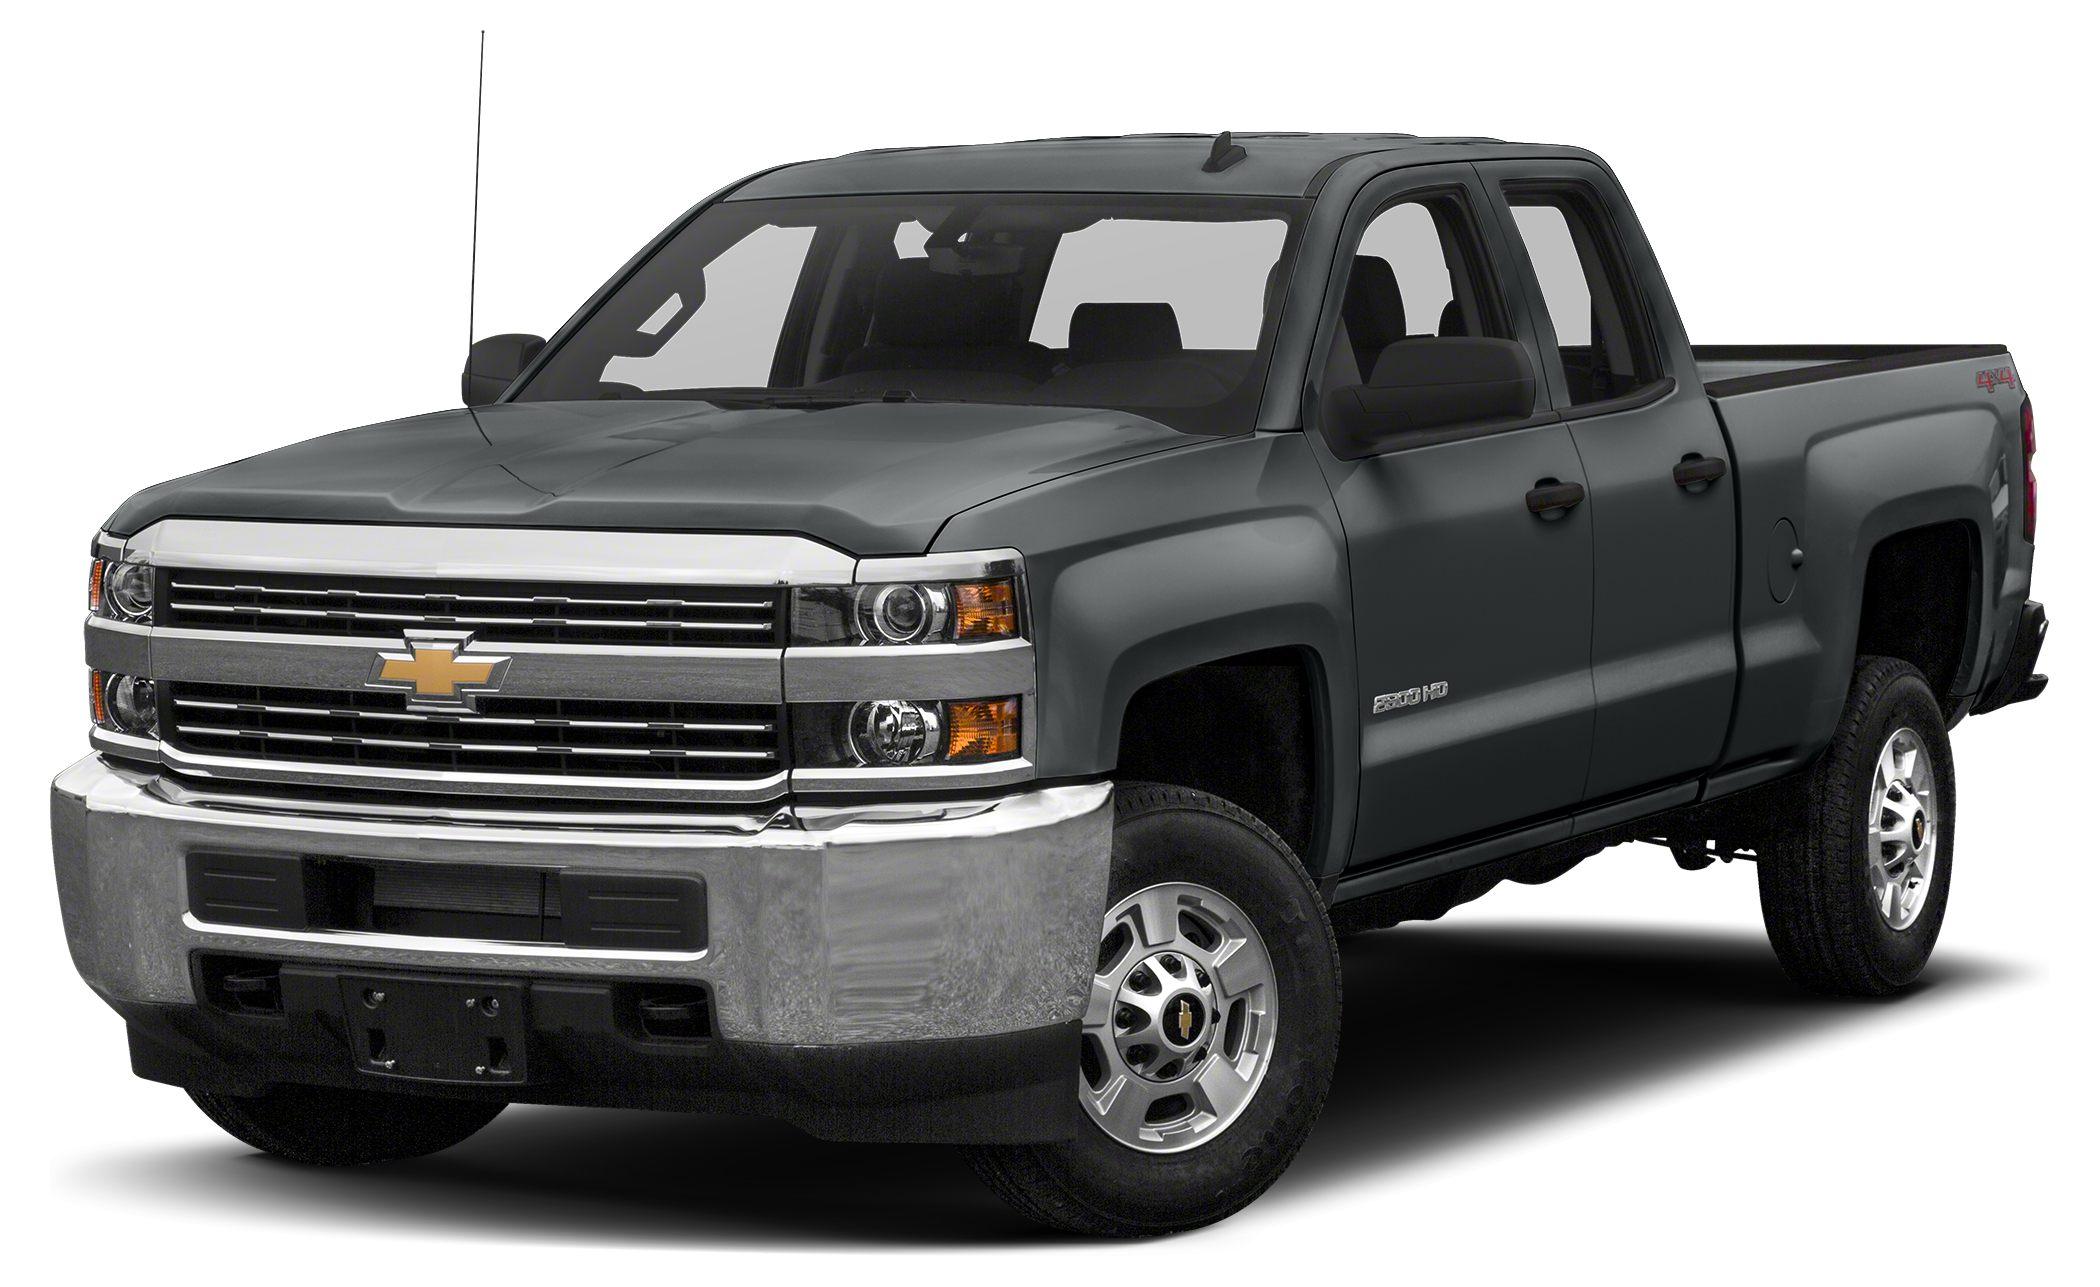 2016 Chevrolet Silverado 2500HD WT Work Truck trim BLACK exterior and JET BLACK  DARK ASH interi